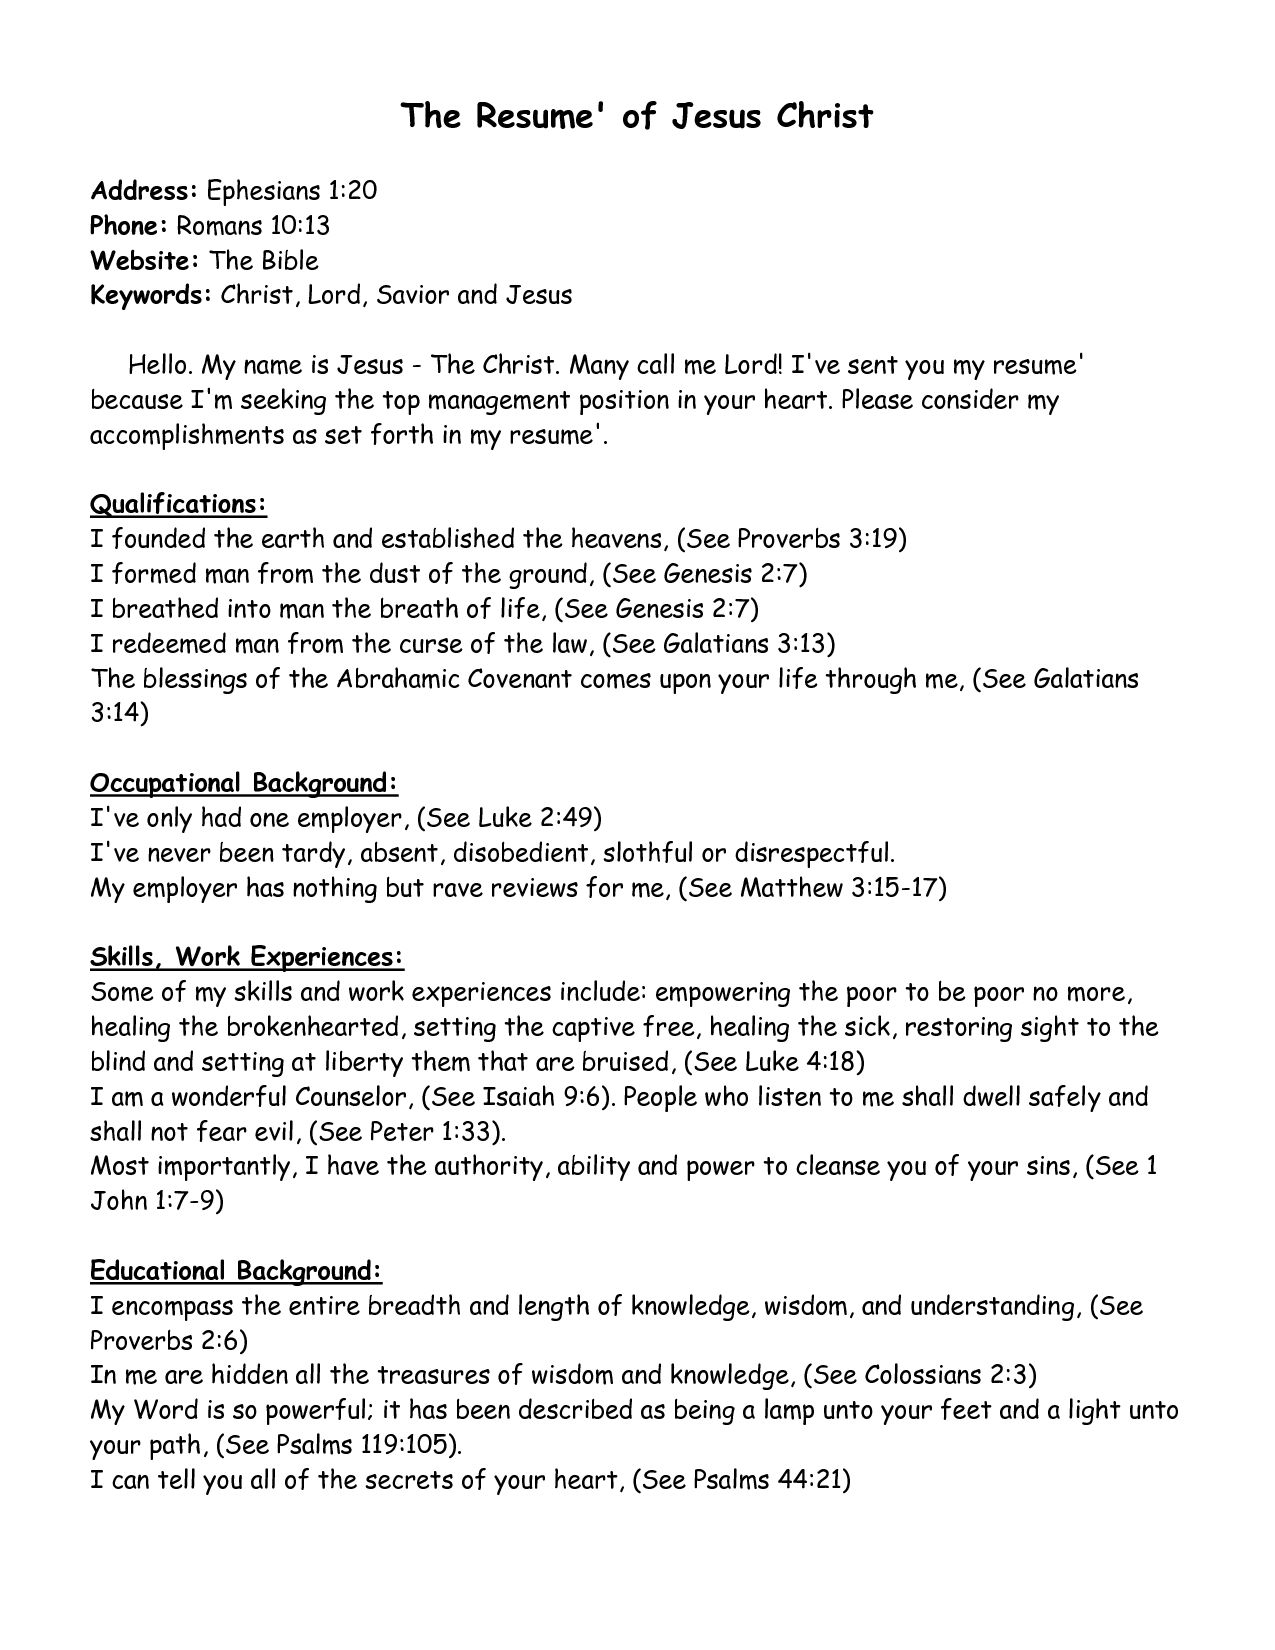 The Resume of Jesus Christ | My Rock | Pinterest | Intercession ...